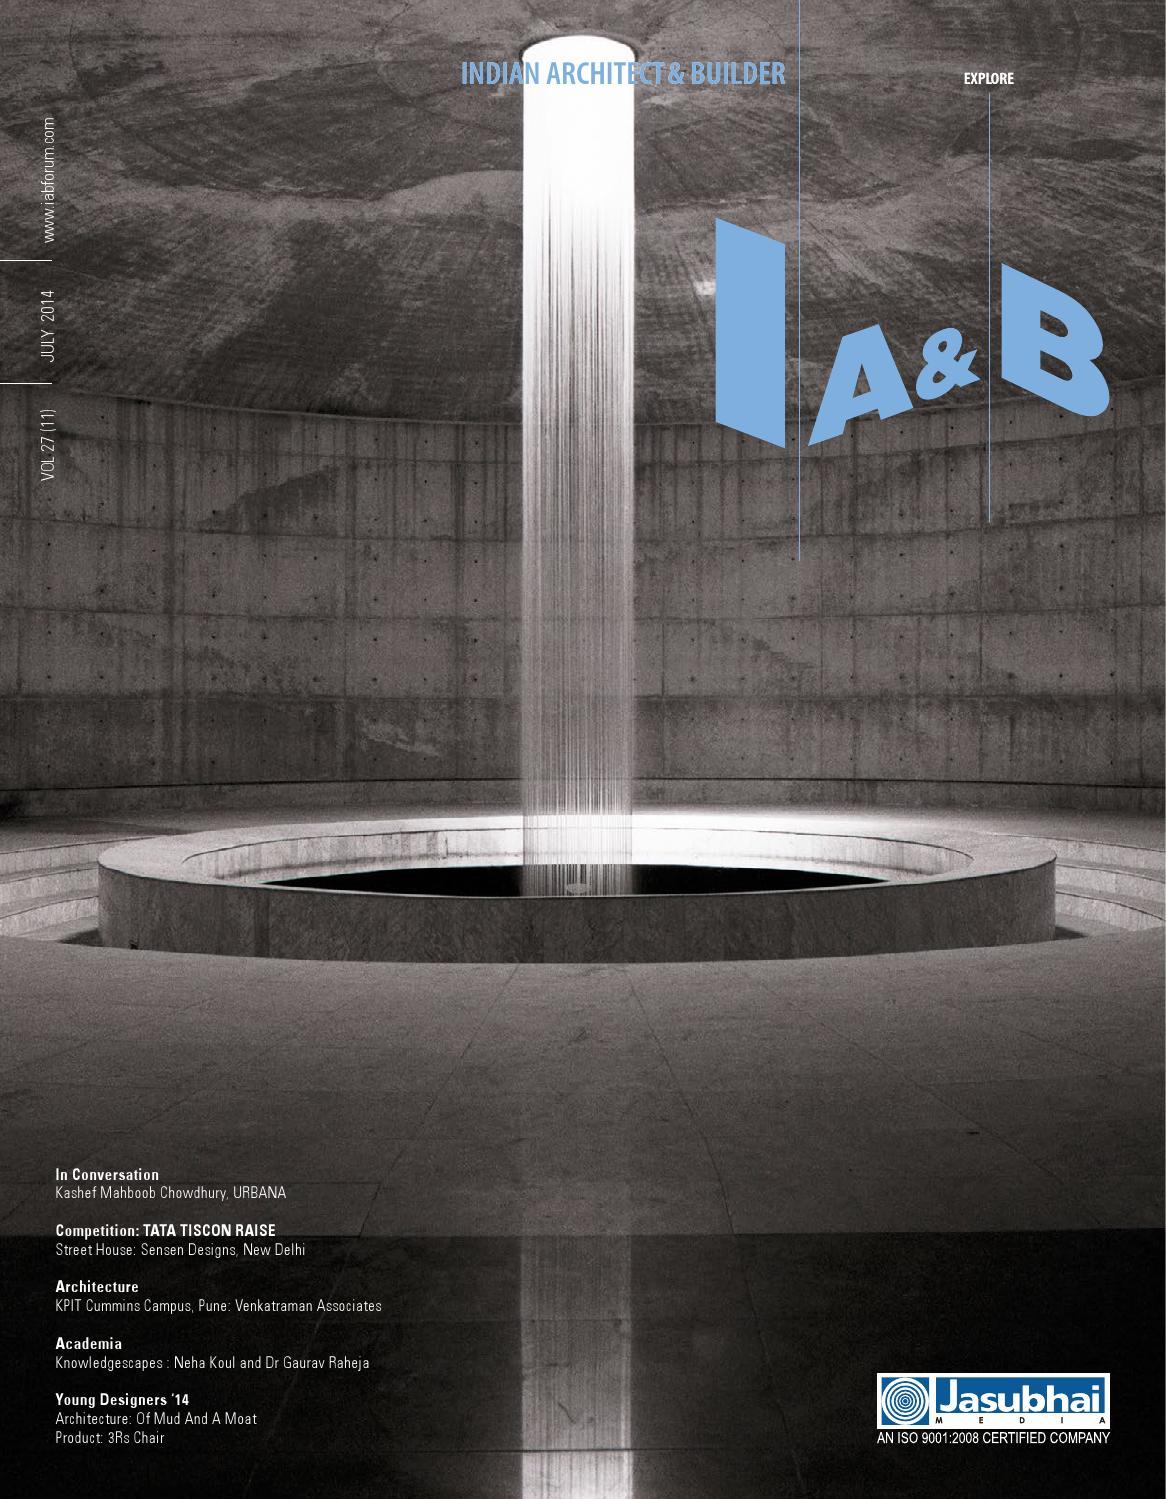 ia b july 2014 by indian architect builder magazine issuu